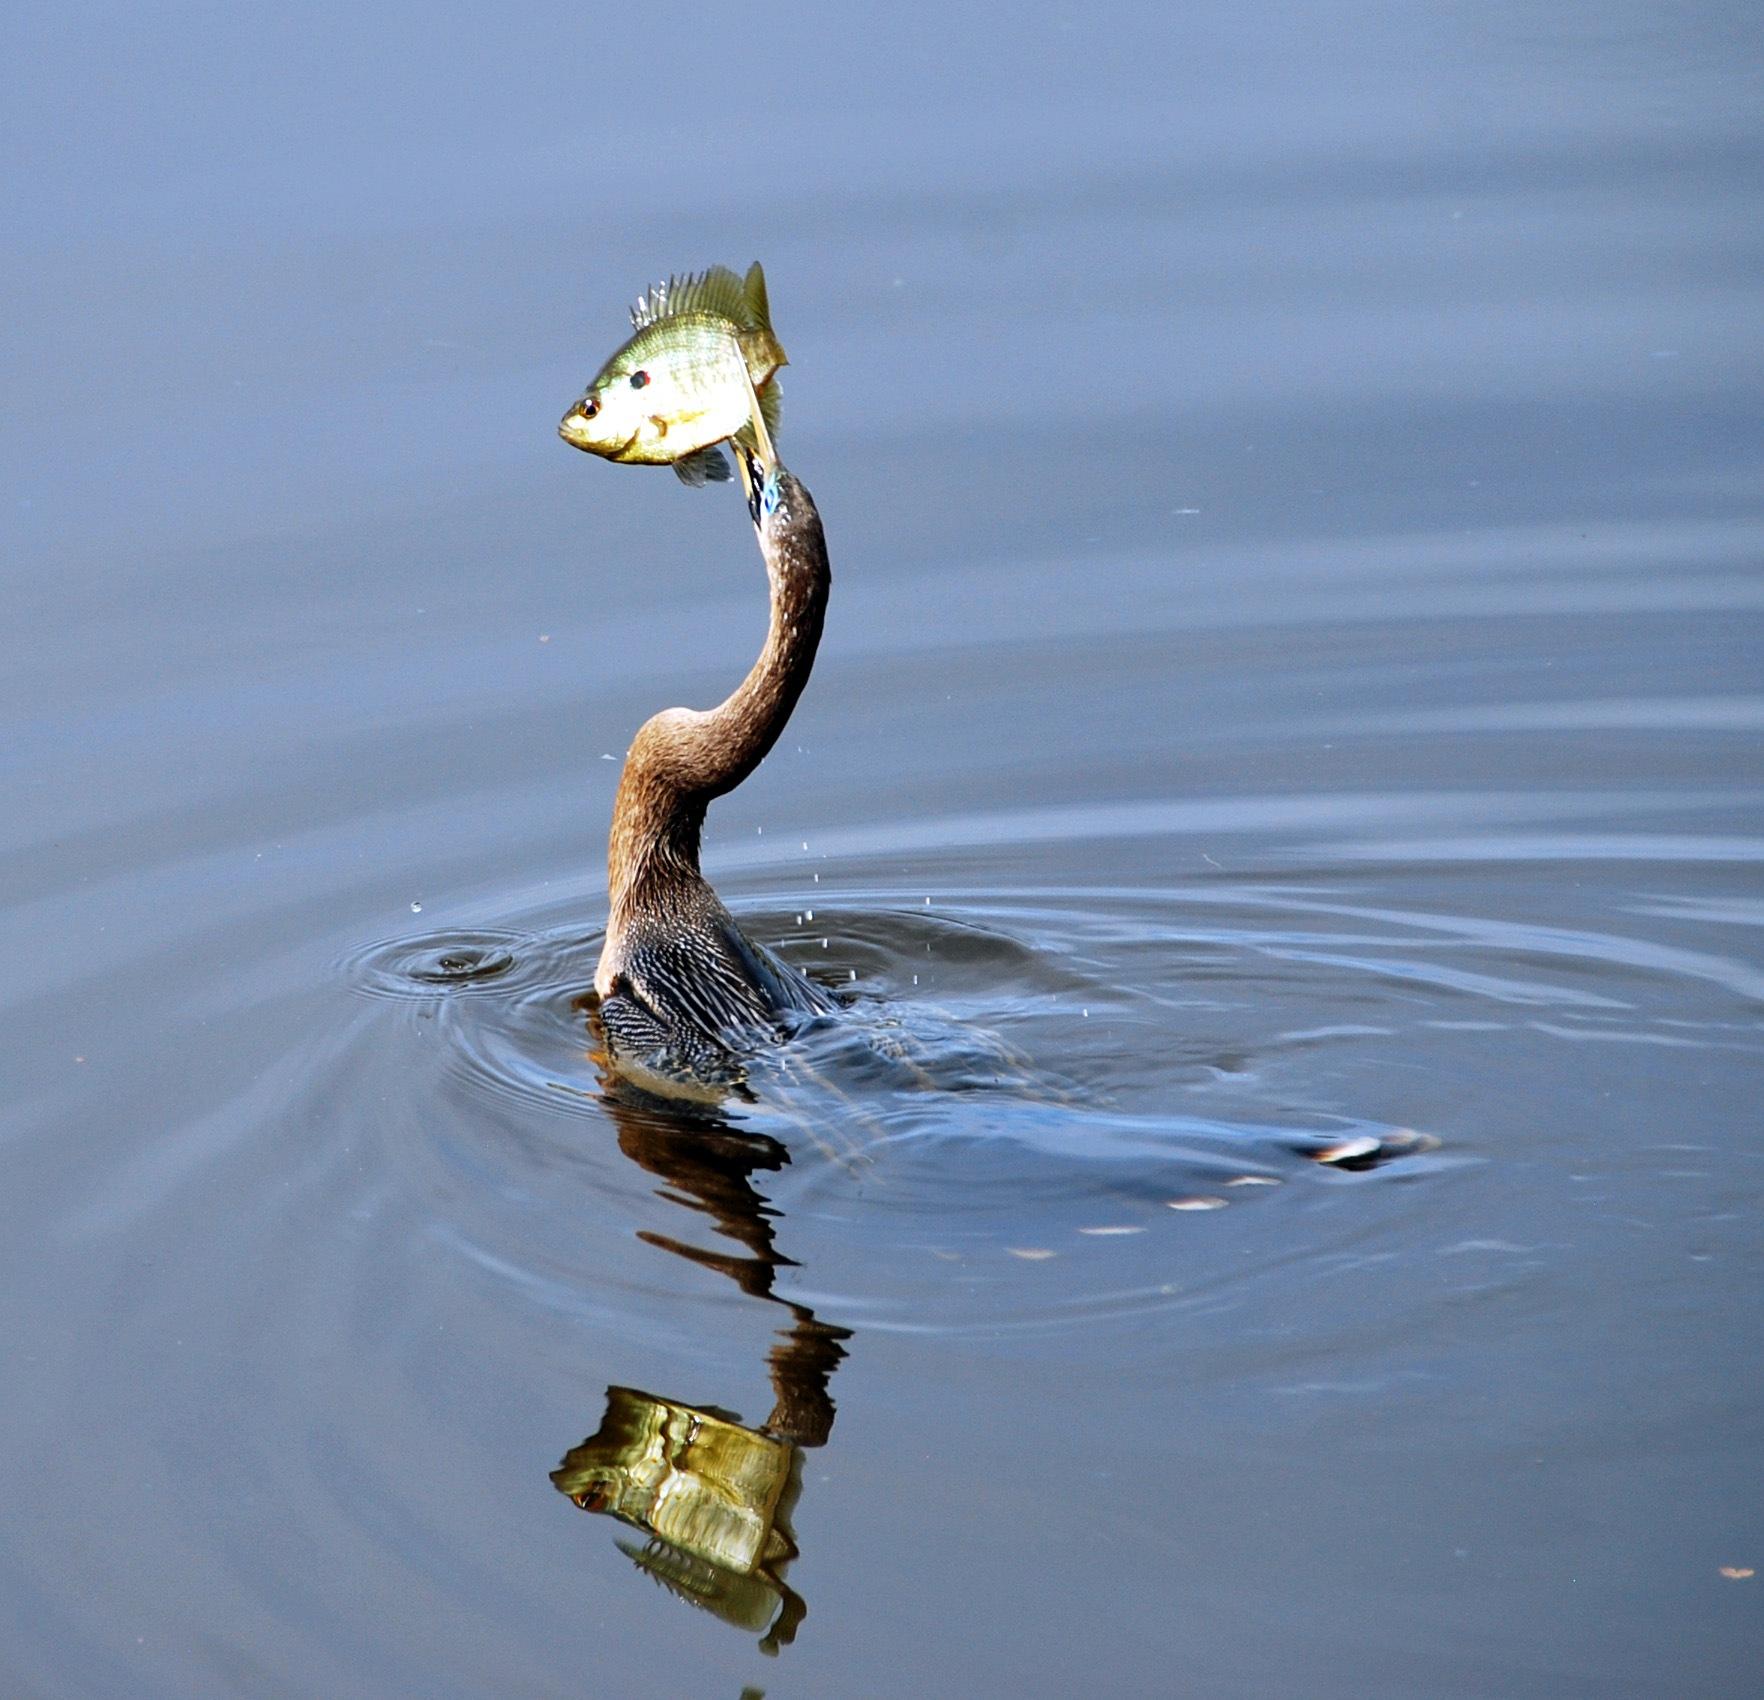 Hungry Bird by Tom Priestley